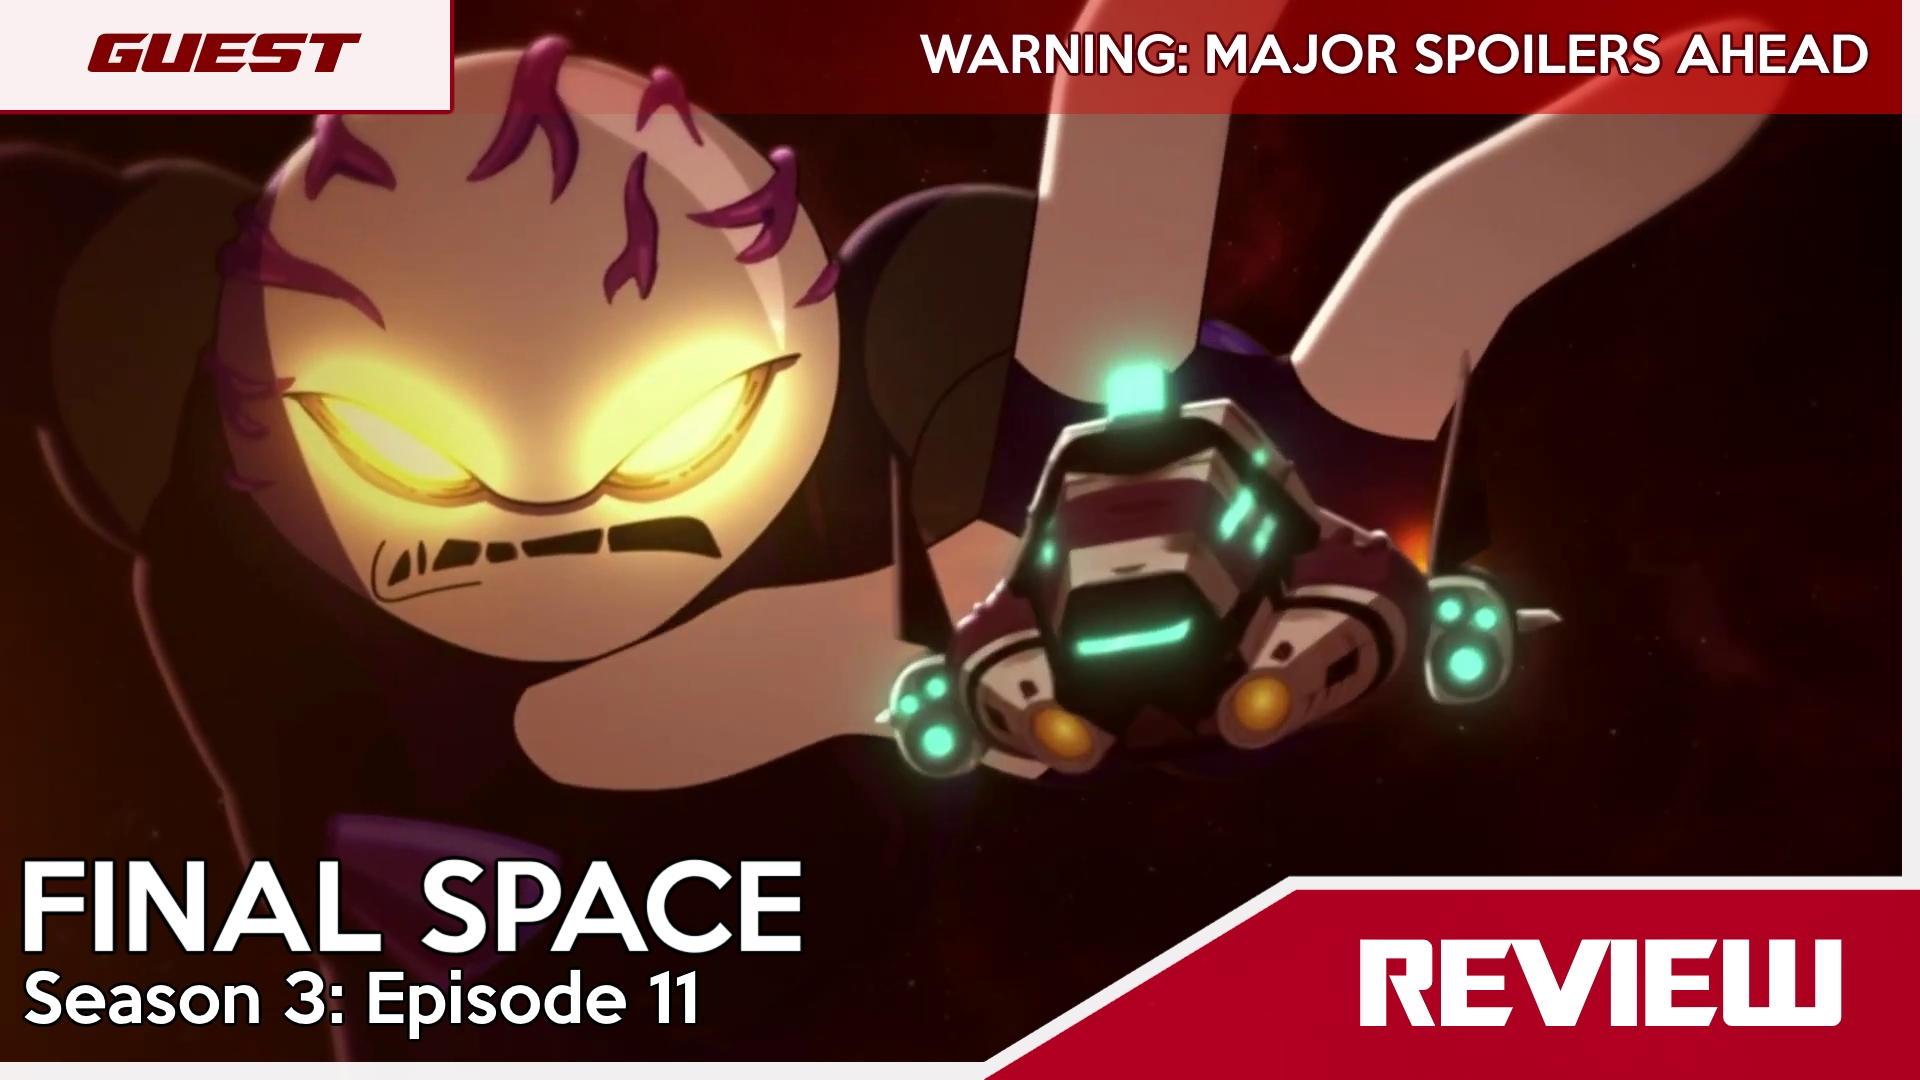 Final Space Season 3 Episode 11 Review